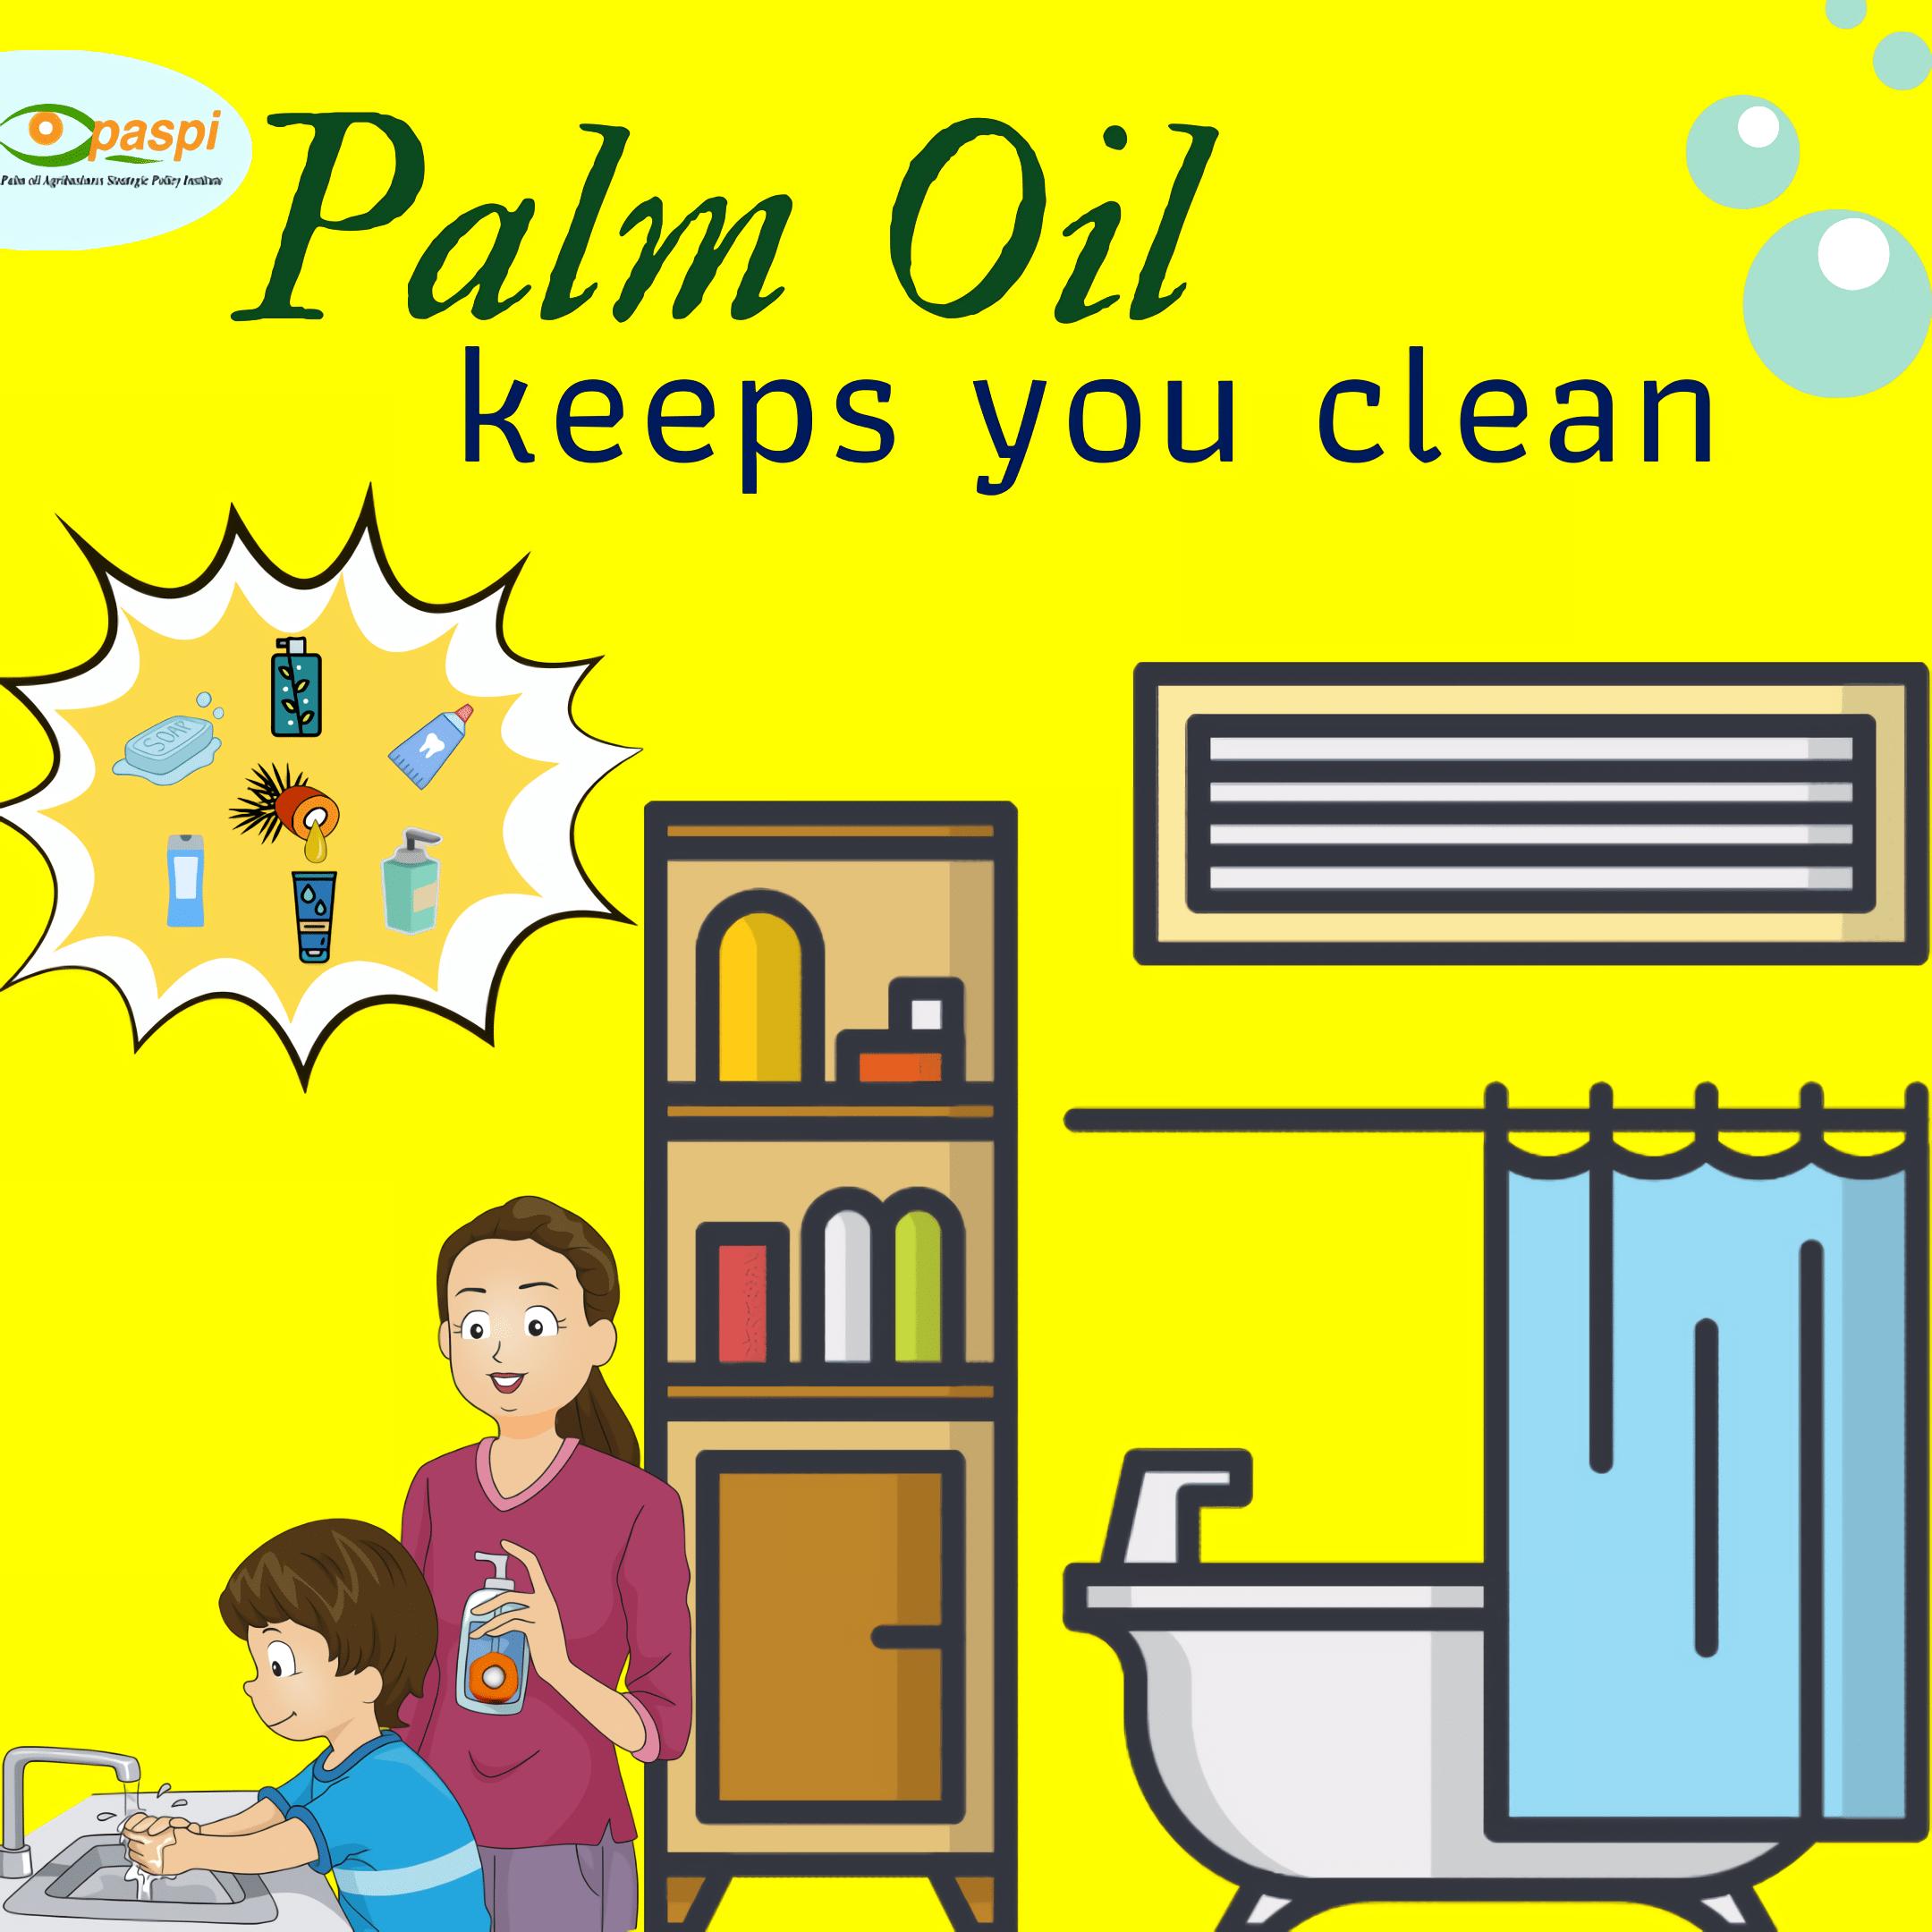 oleochemical palm oil